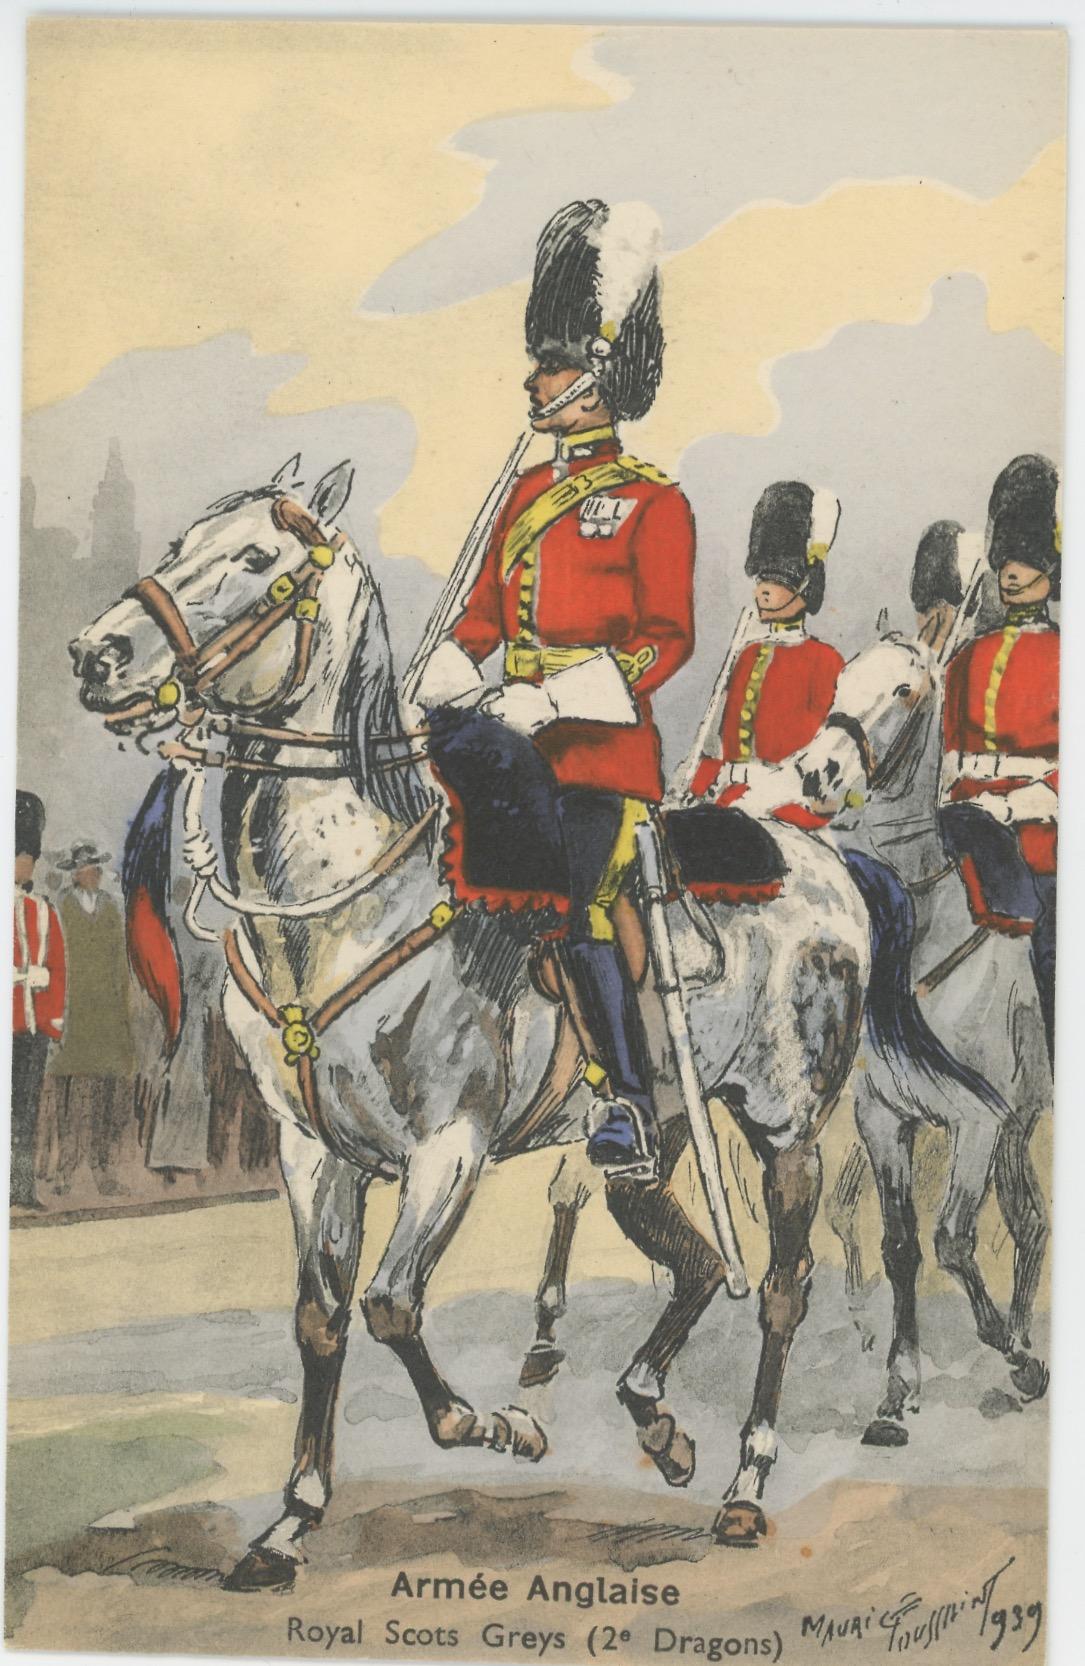 Armée Anglaise Royal Scots Greys 1939 - Maurice Toussaint - Uniforme